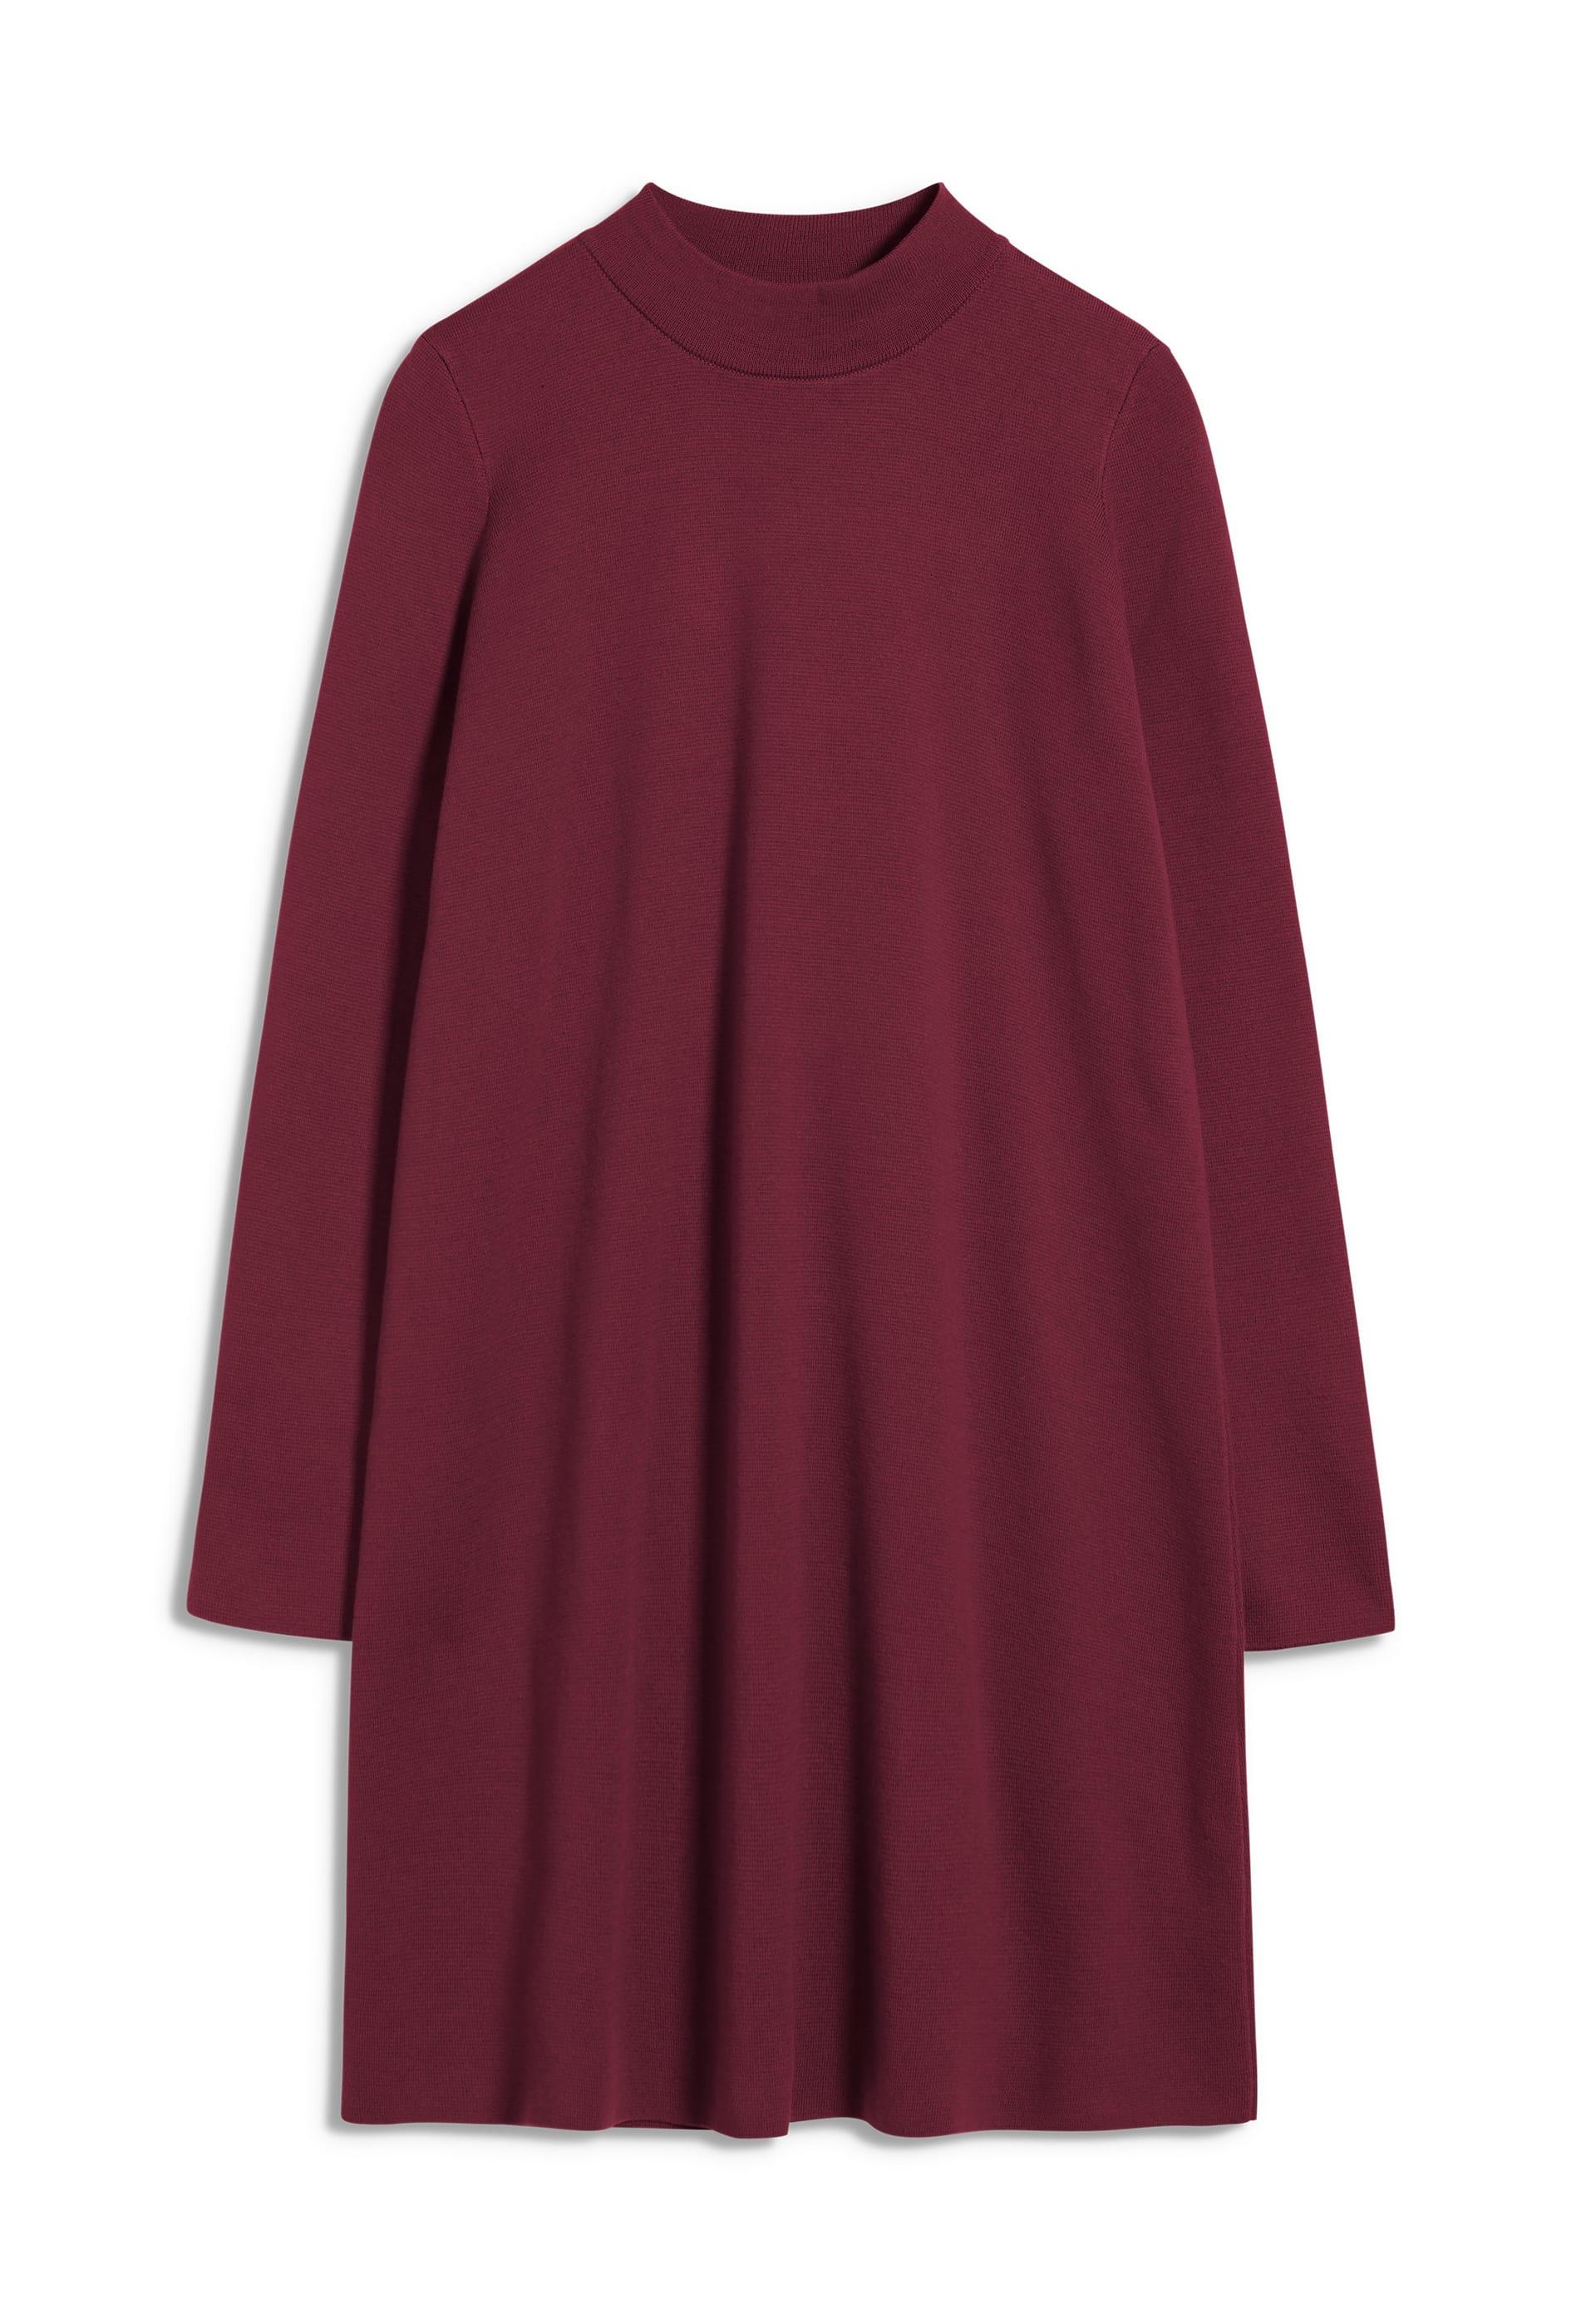 FRIADAA Knit Dress made of Organic Cotton